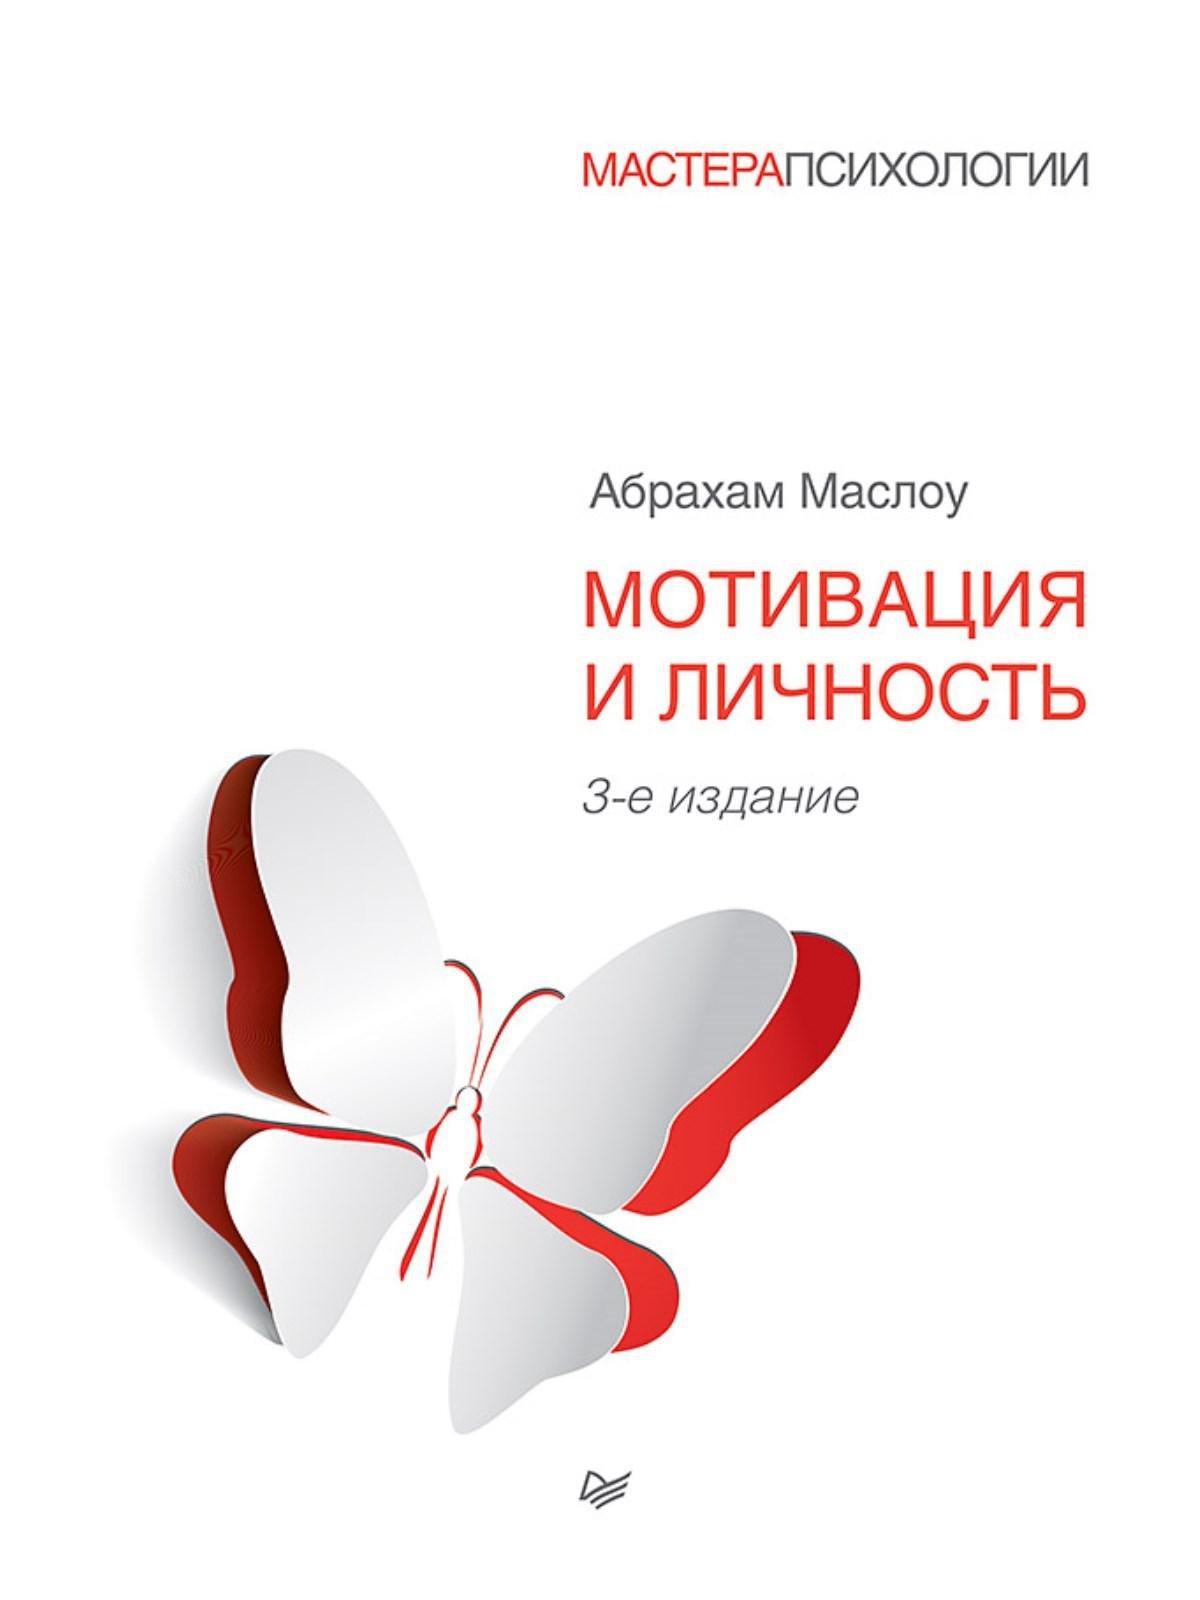 Маслоу А Мотивация и личность. 3-е изд. маслоу абрахам г мотивация и личность 3 е изд